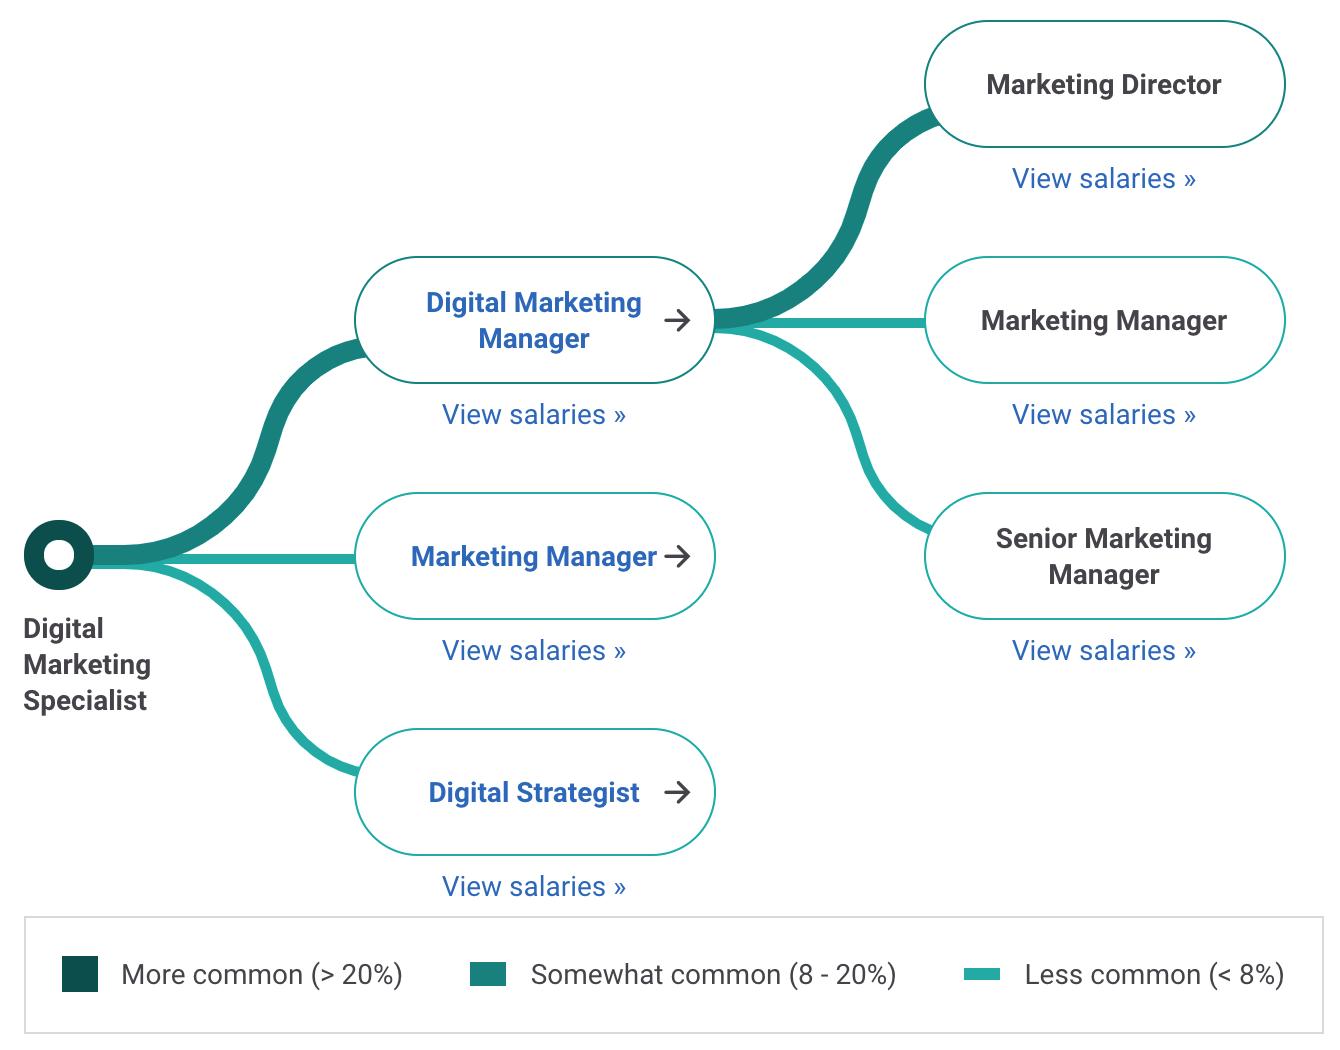 Digital Marketing Specialist Career Path